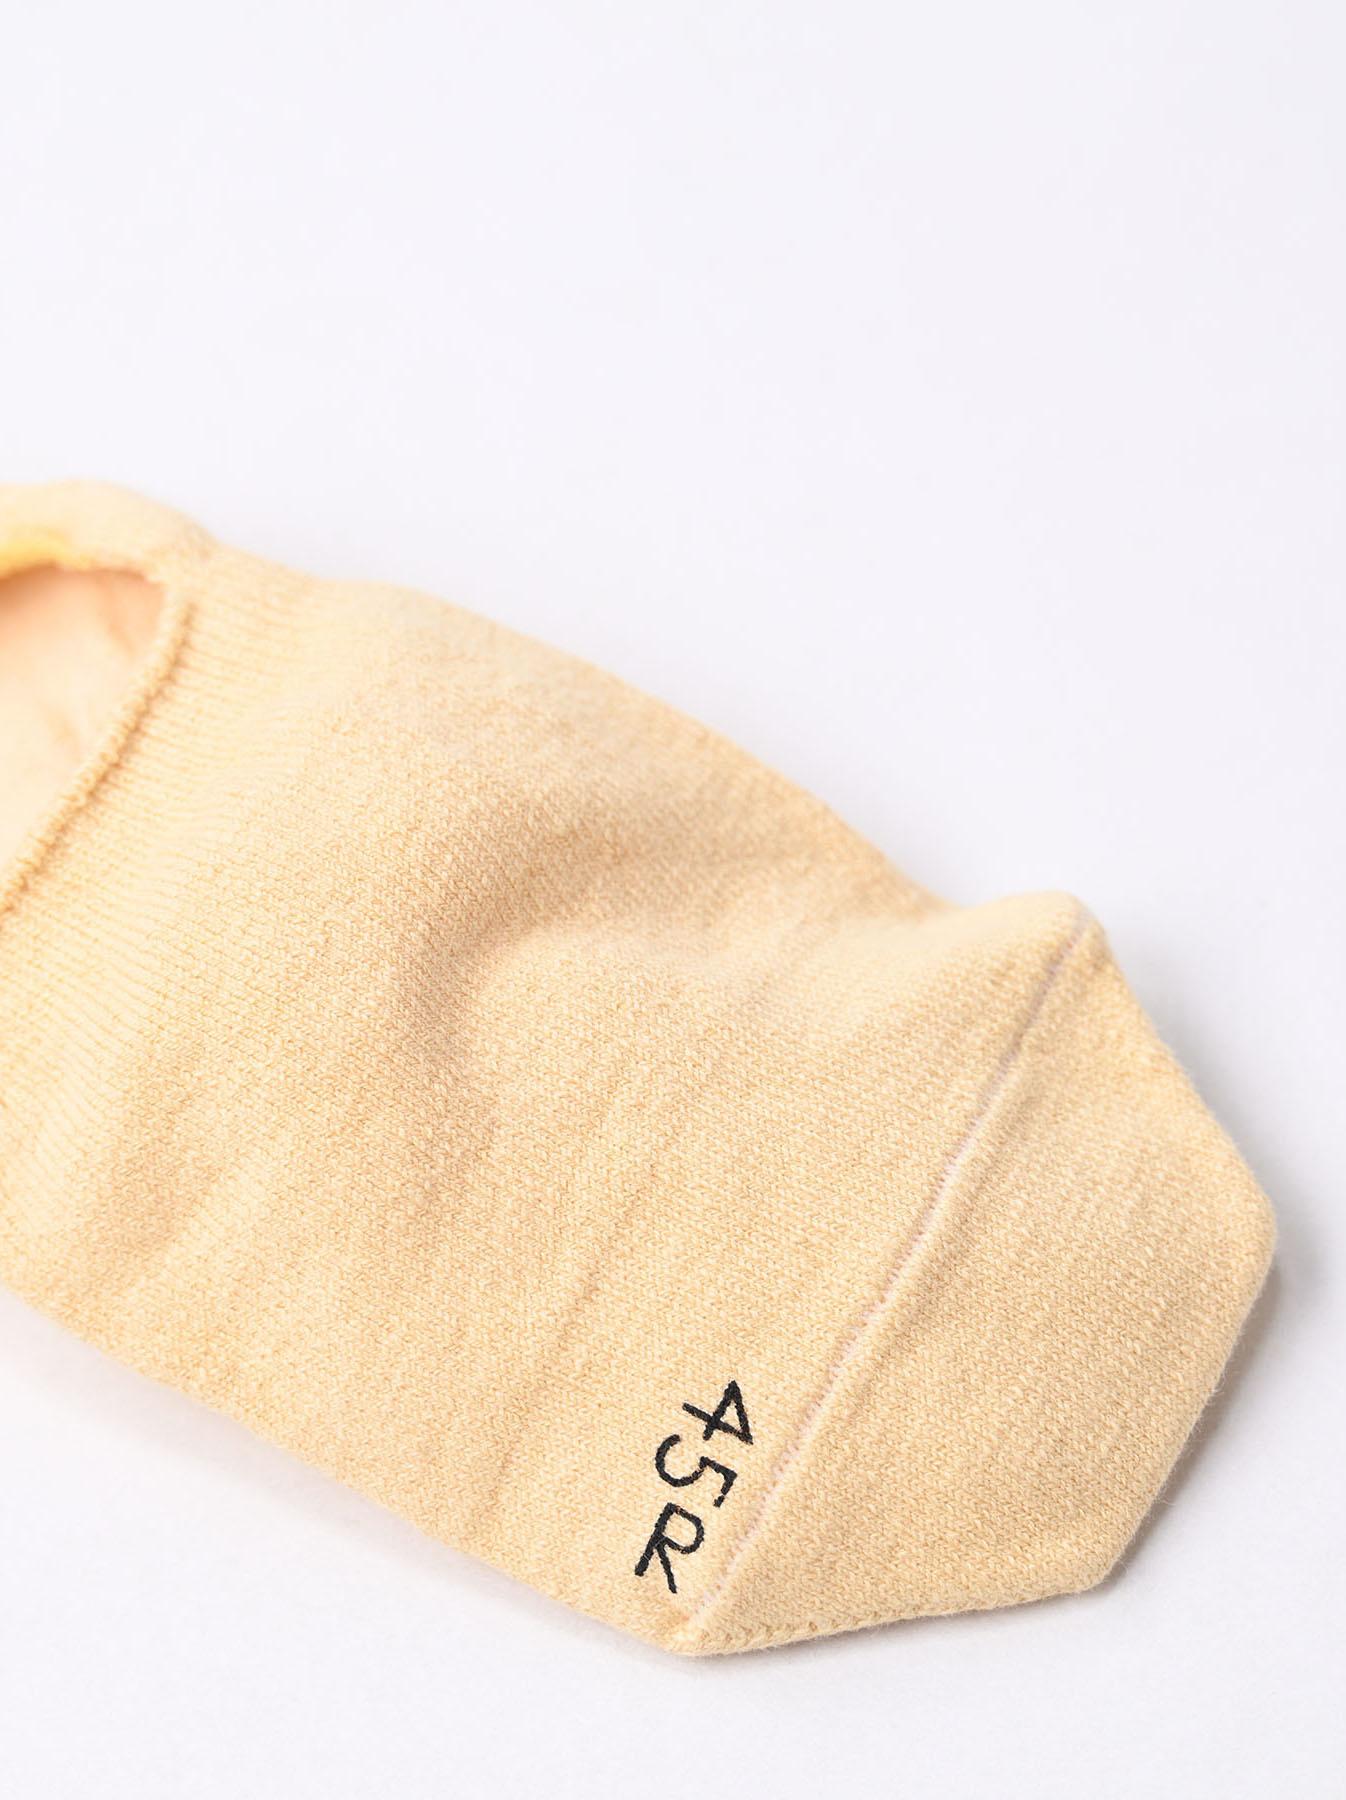 45 Star Sole Socks (0421)-5